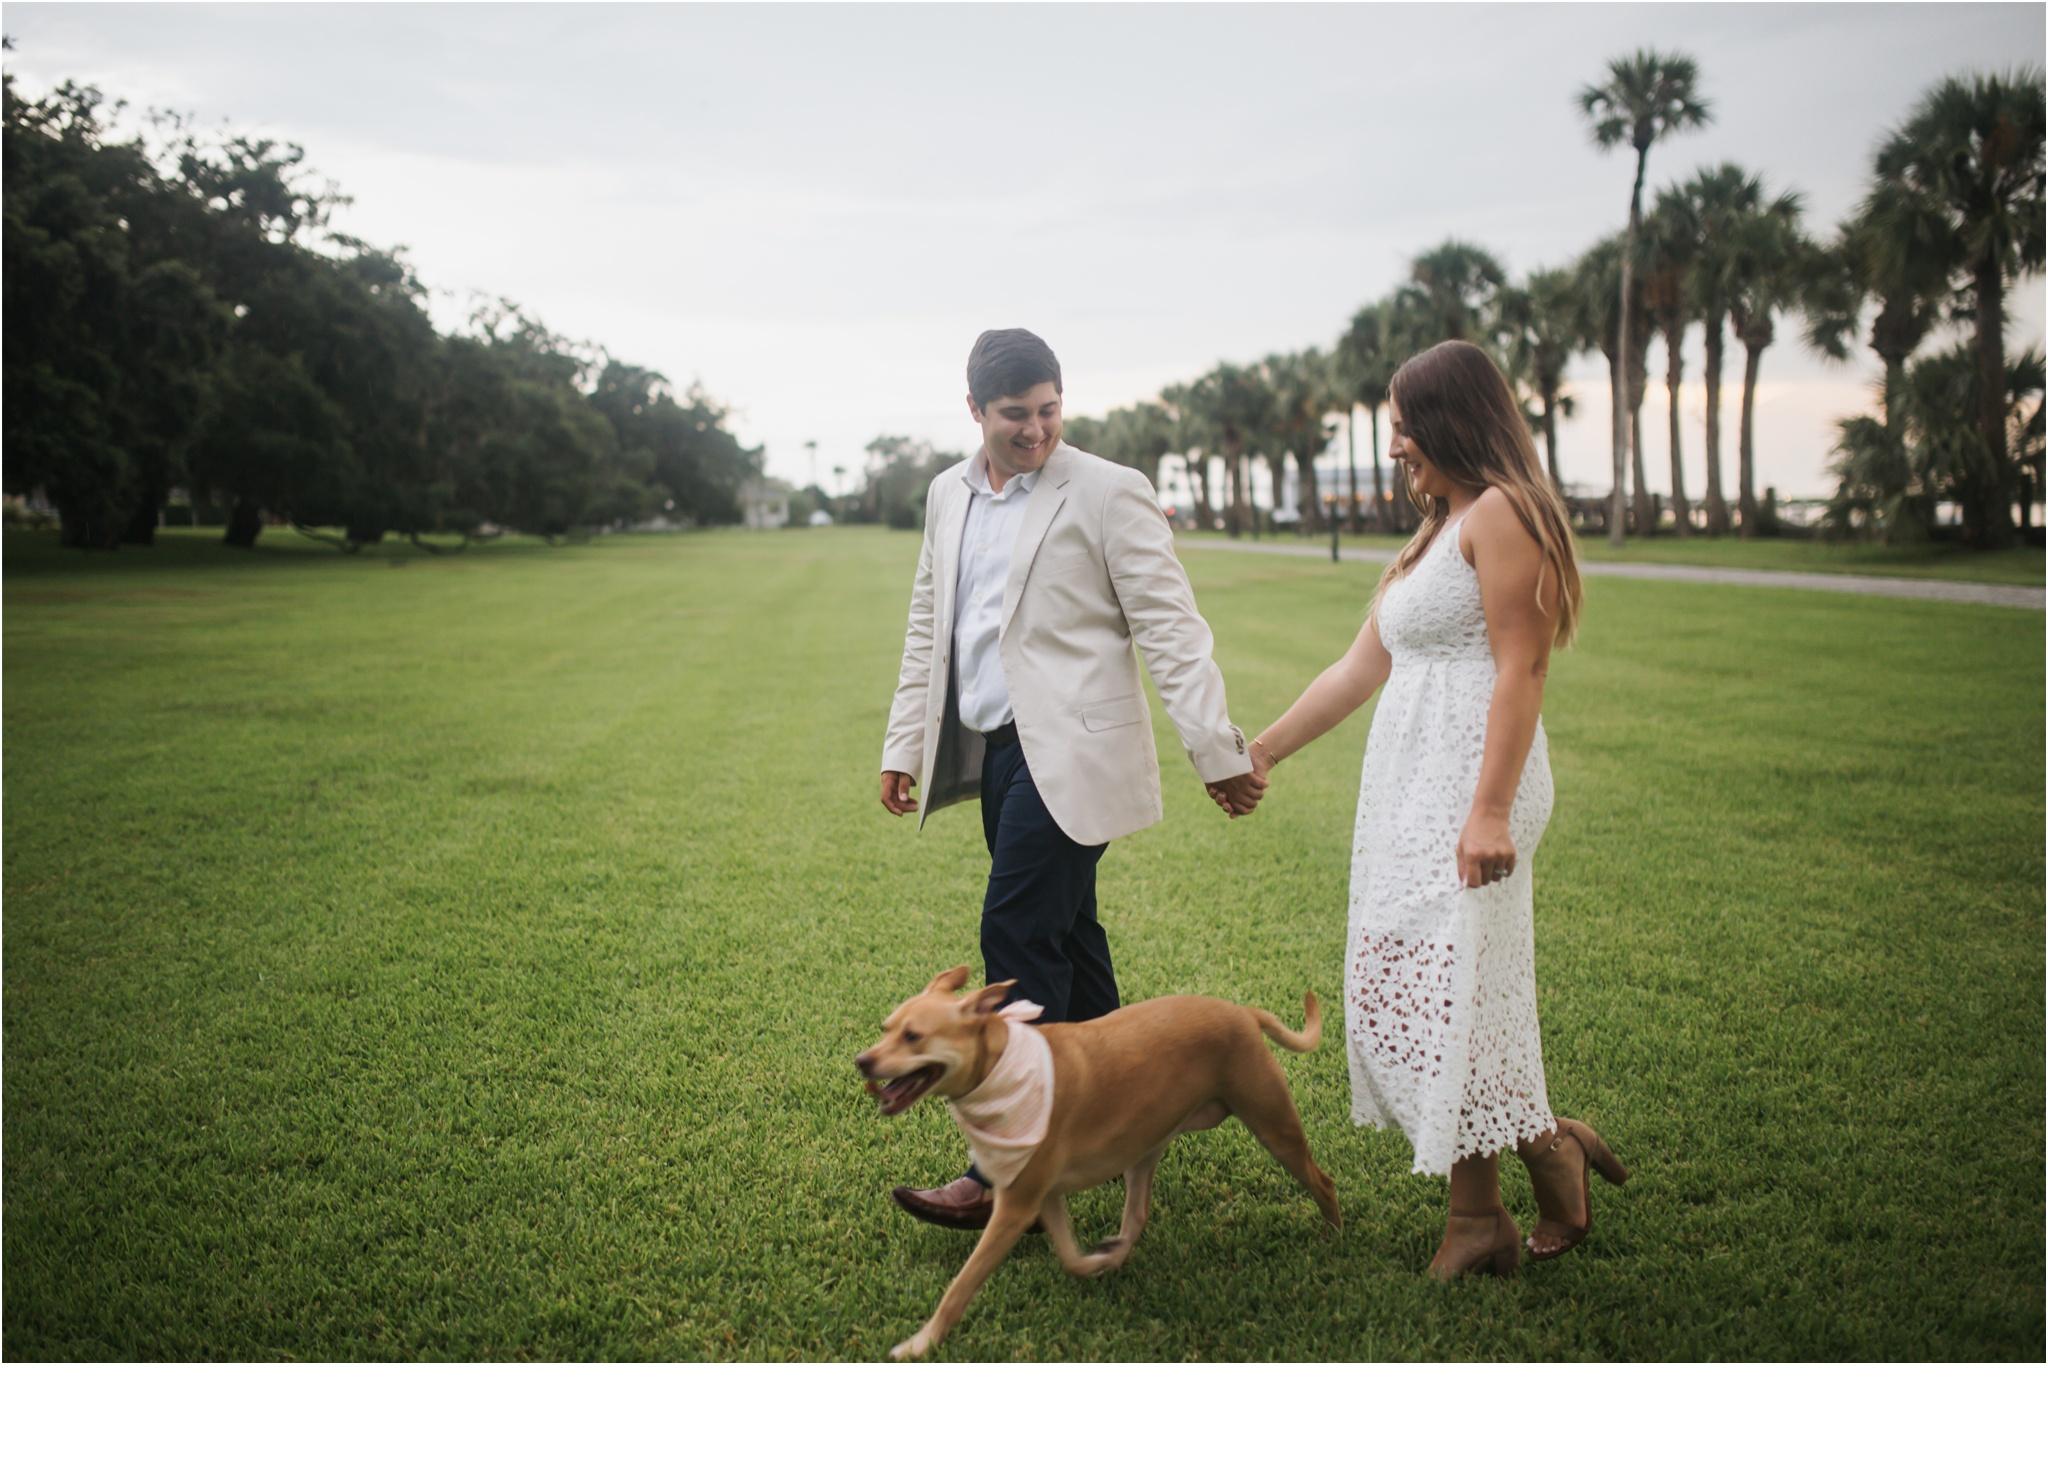 Rainey_Gregg_Photography_St._Simons_Island_Georgia_California_Wedding_Portrait_Photography_1137.jpg